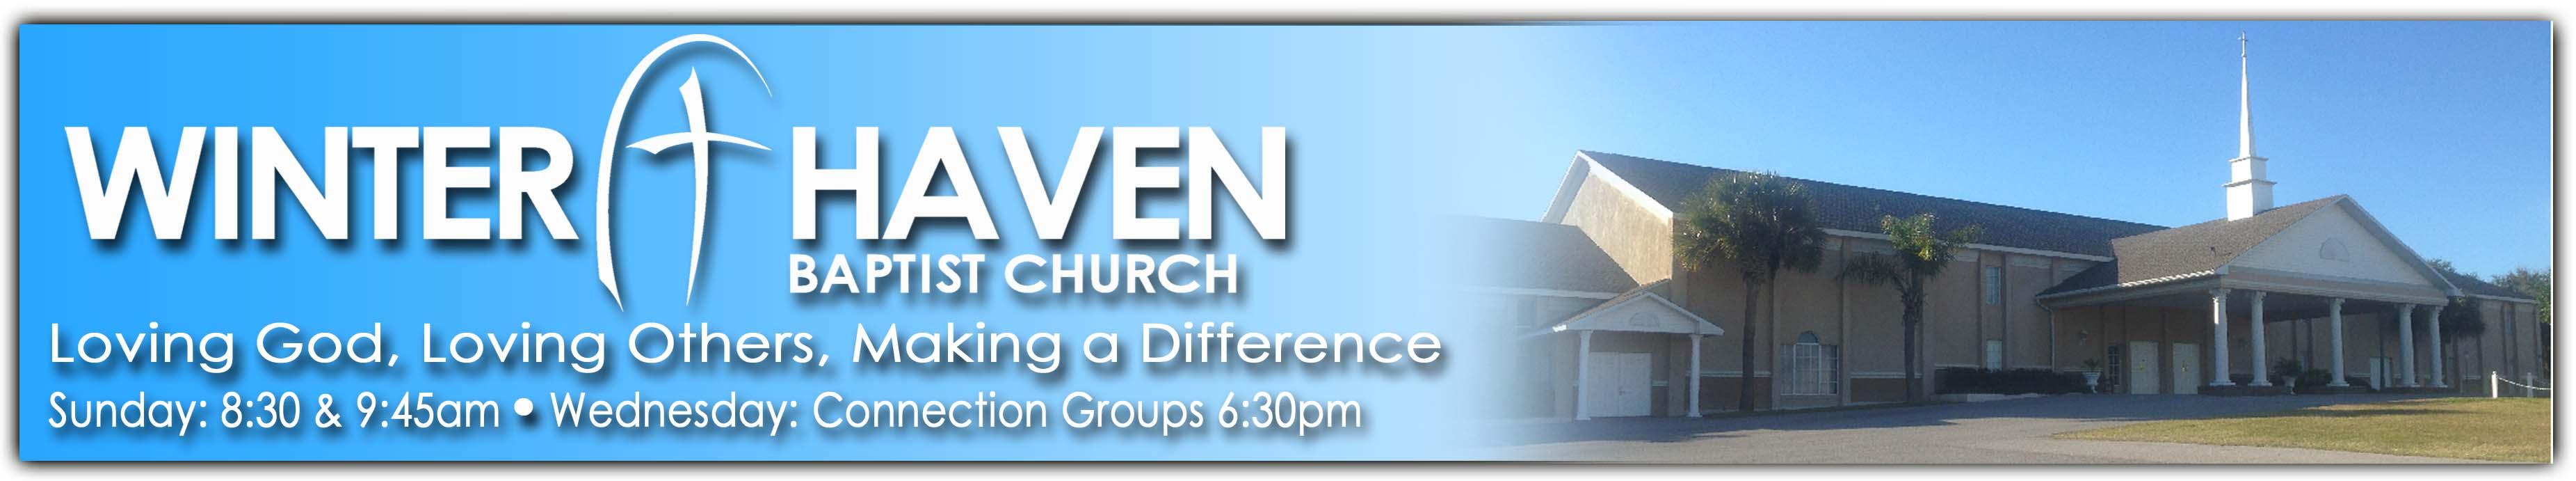 Winter Haven Baptist Church